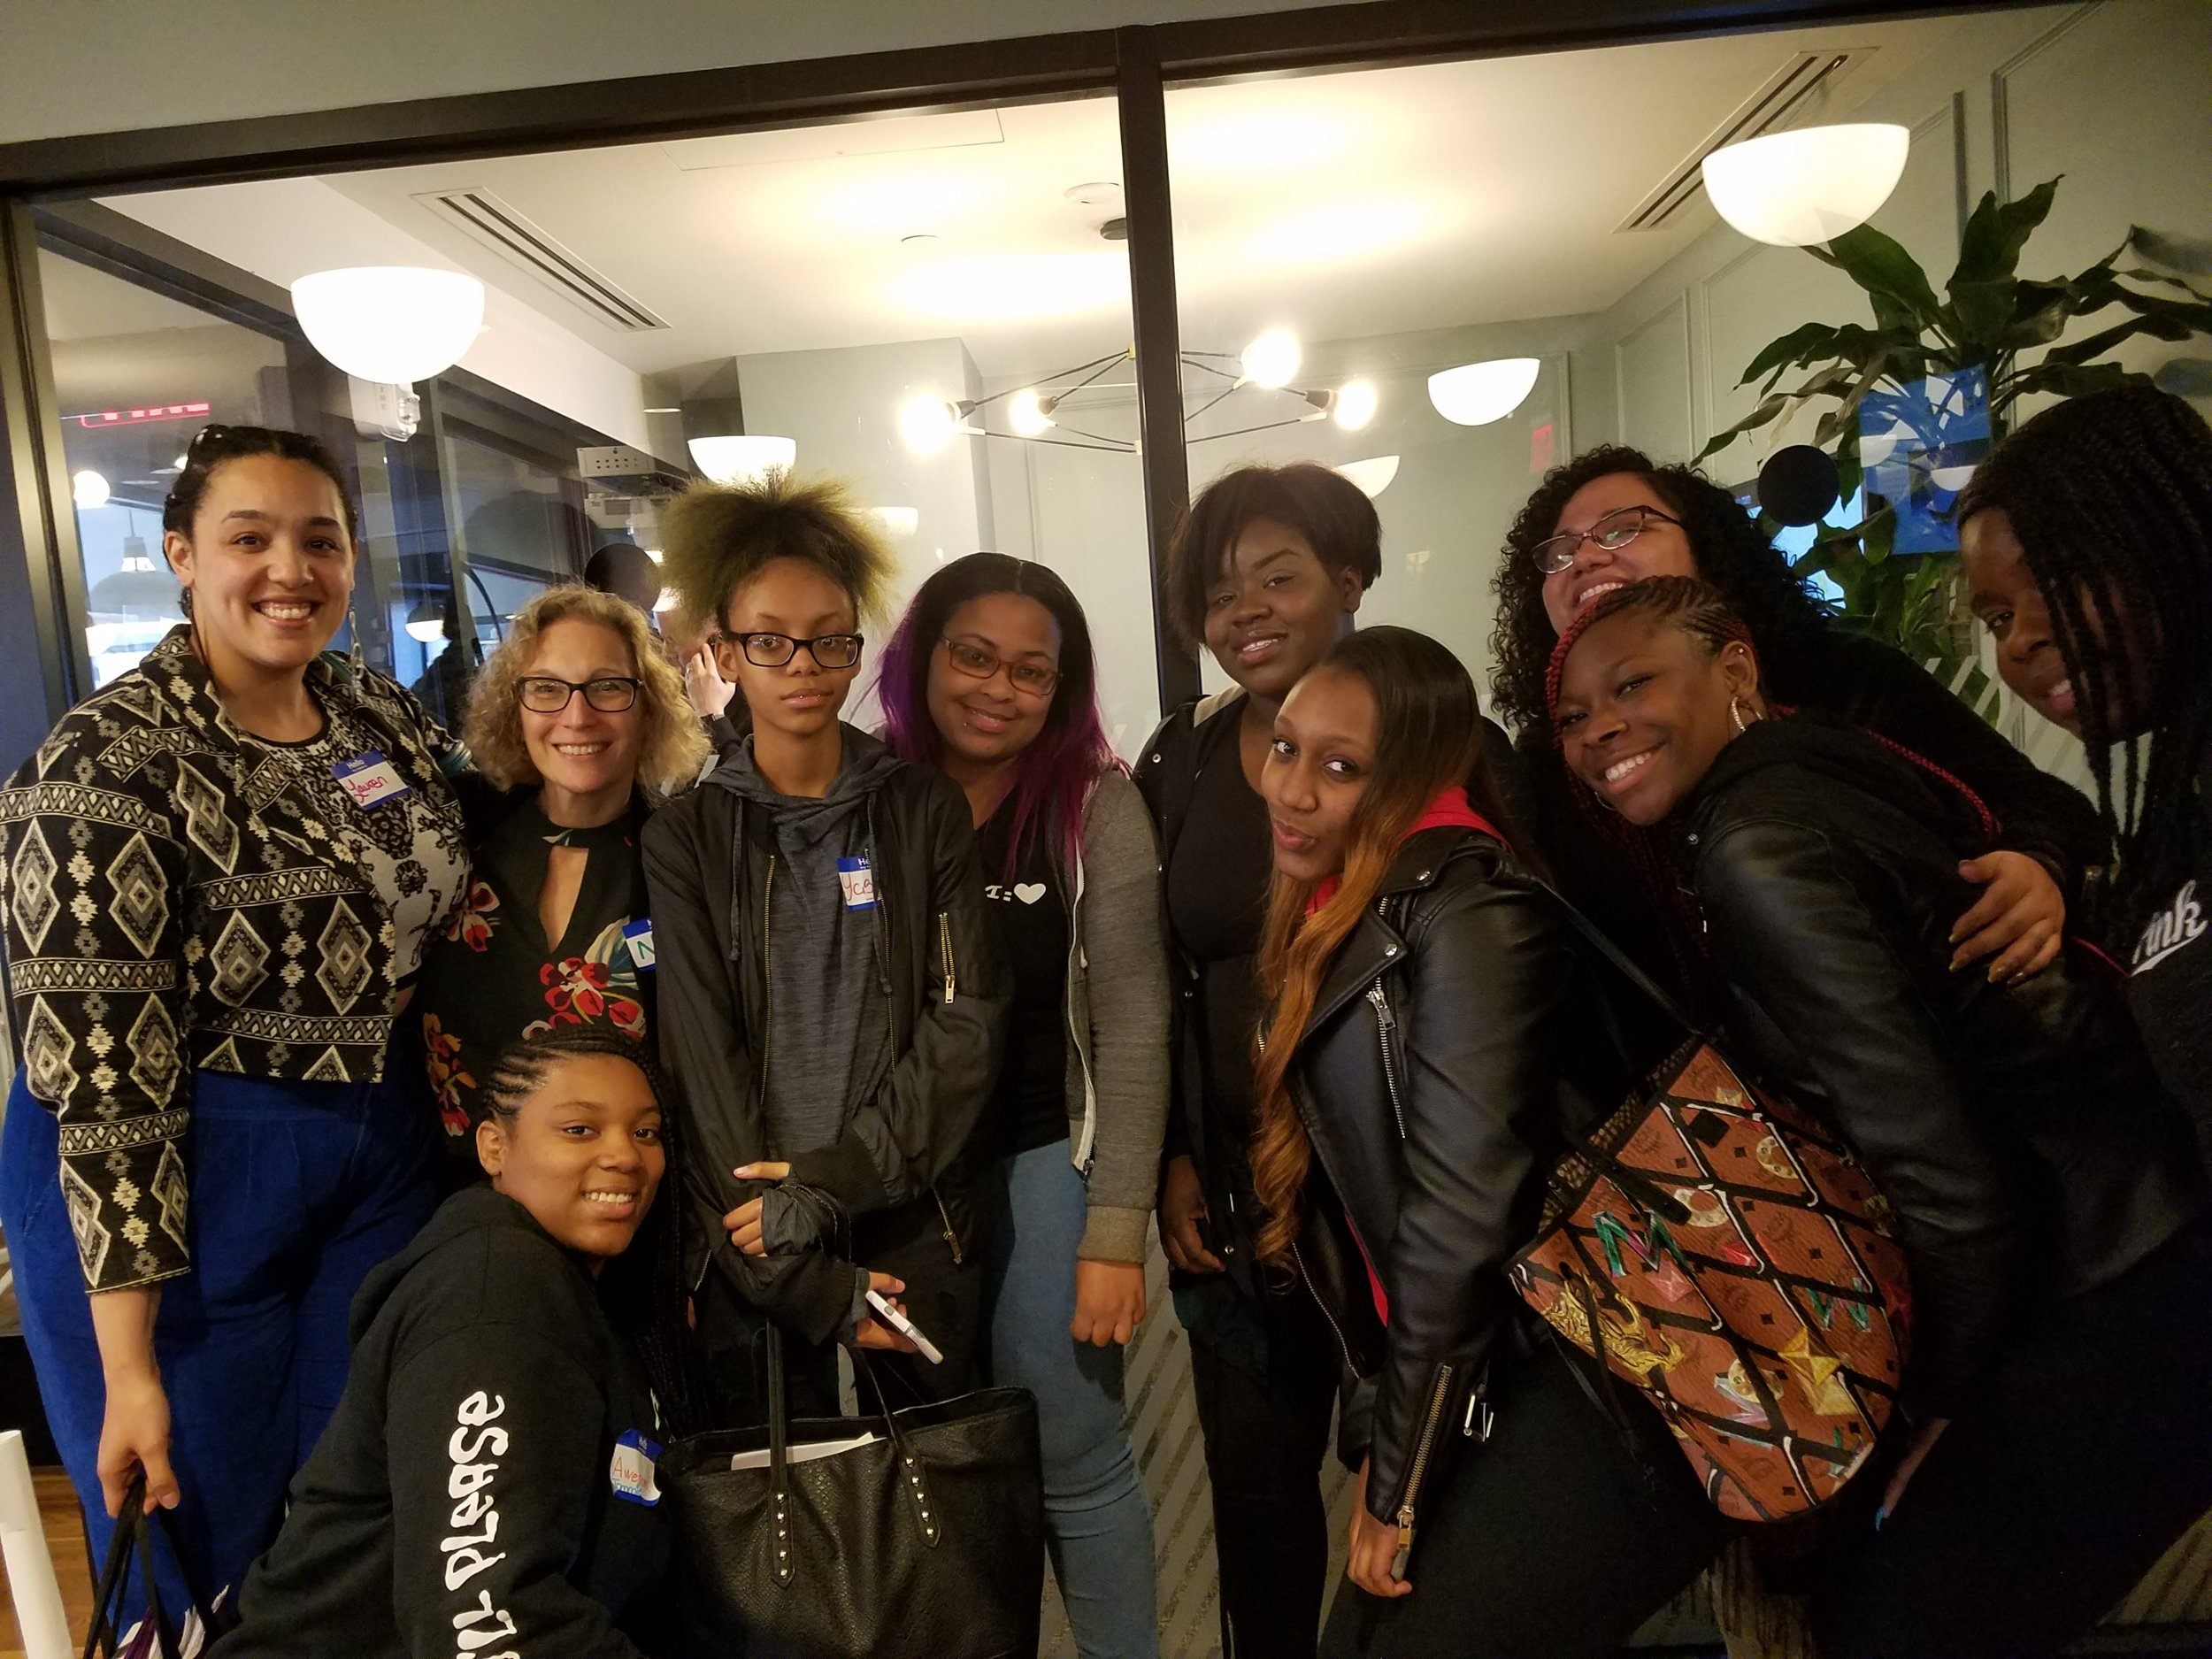 Young Women's Leadership Program of Metropolitan Diploma Plus High School